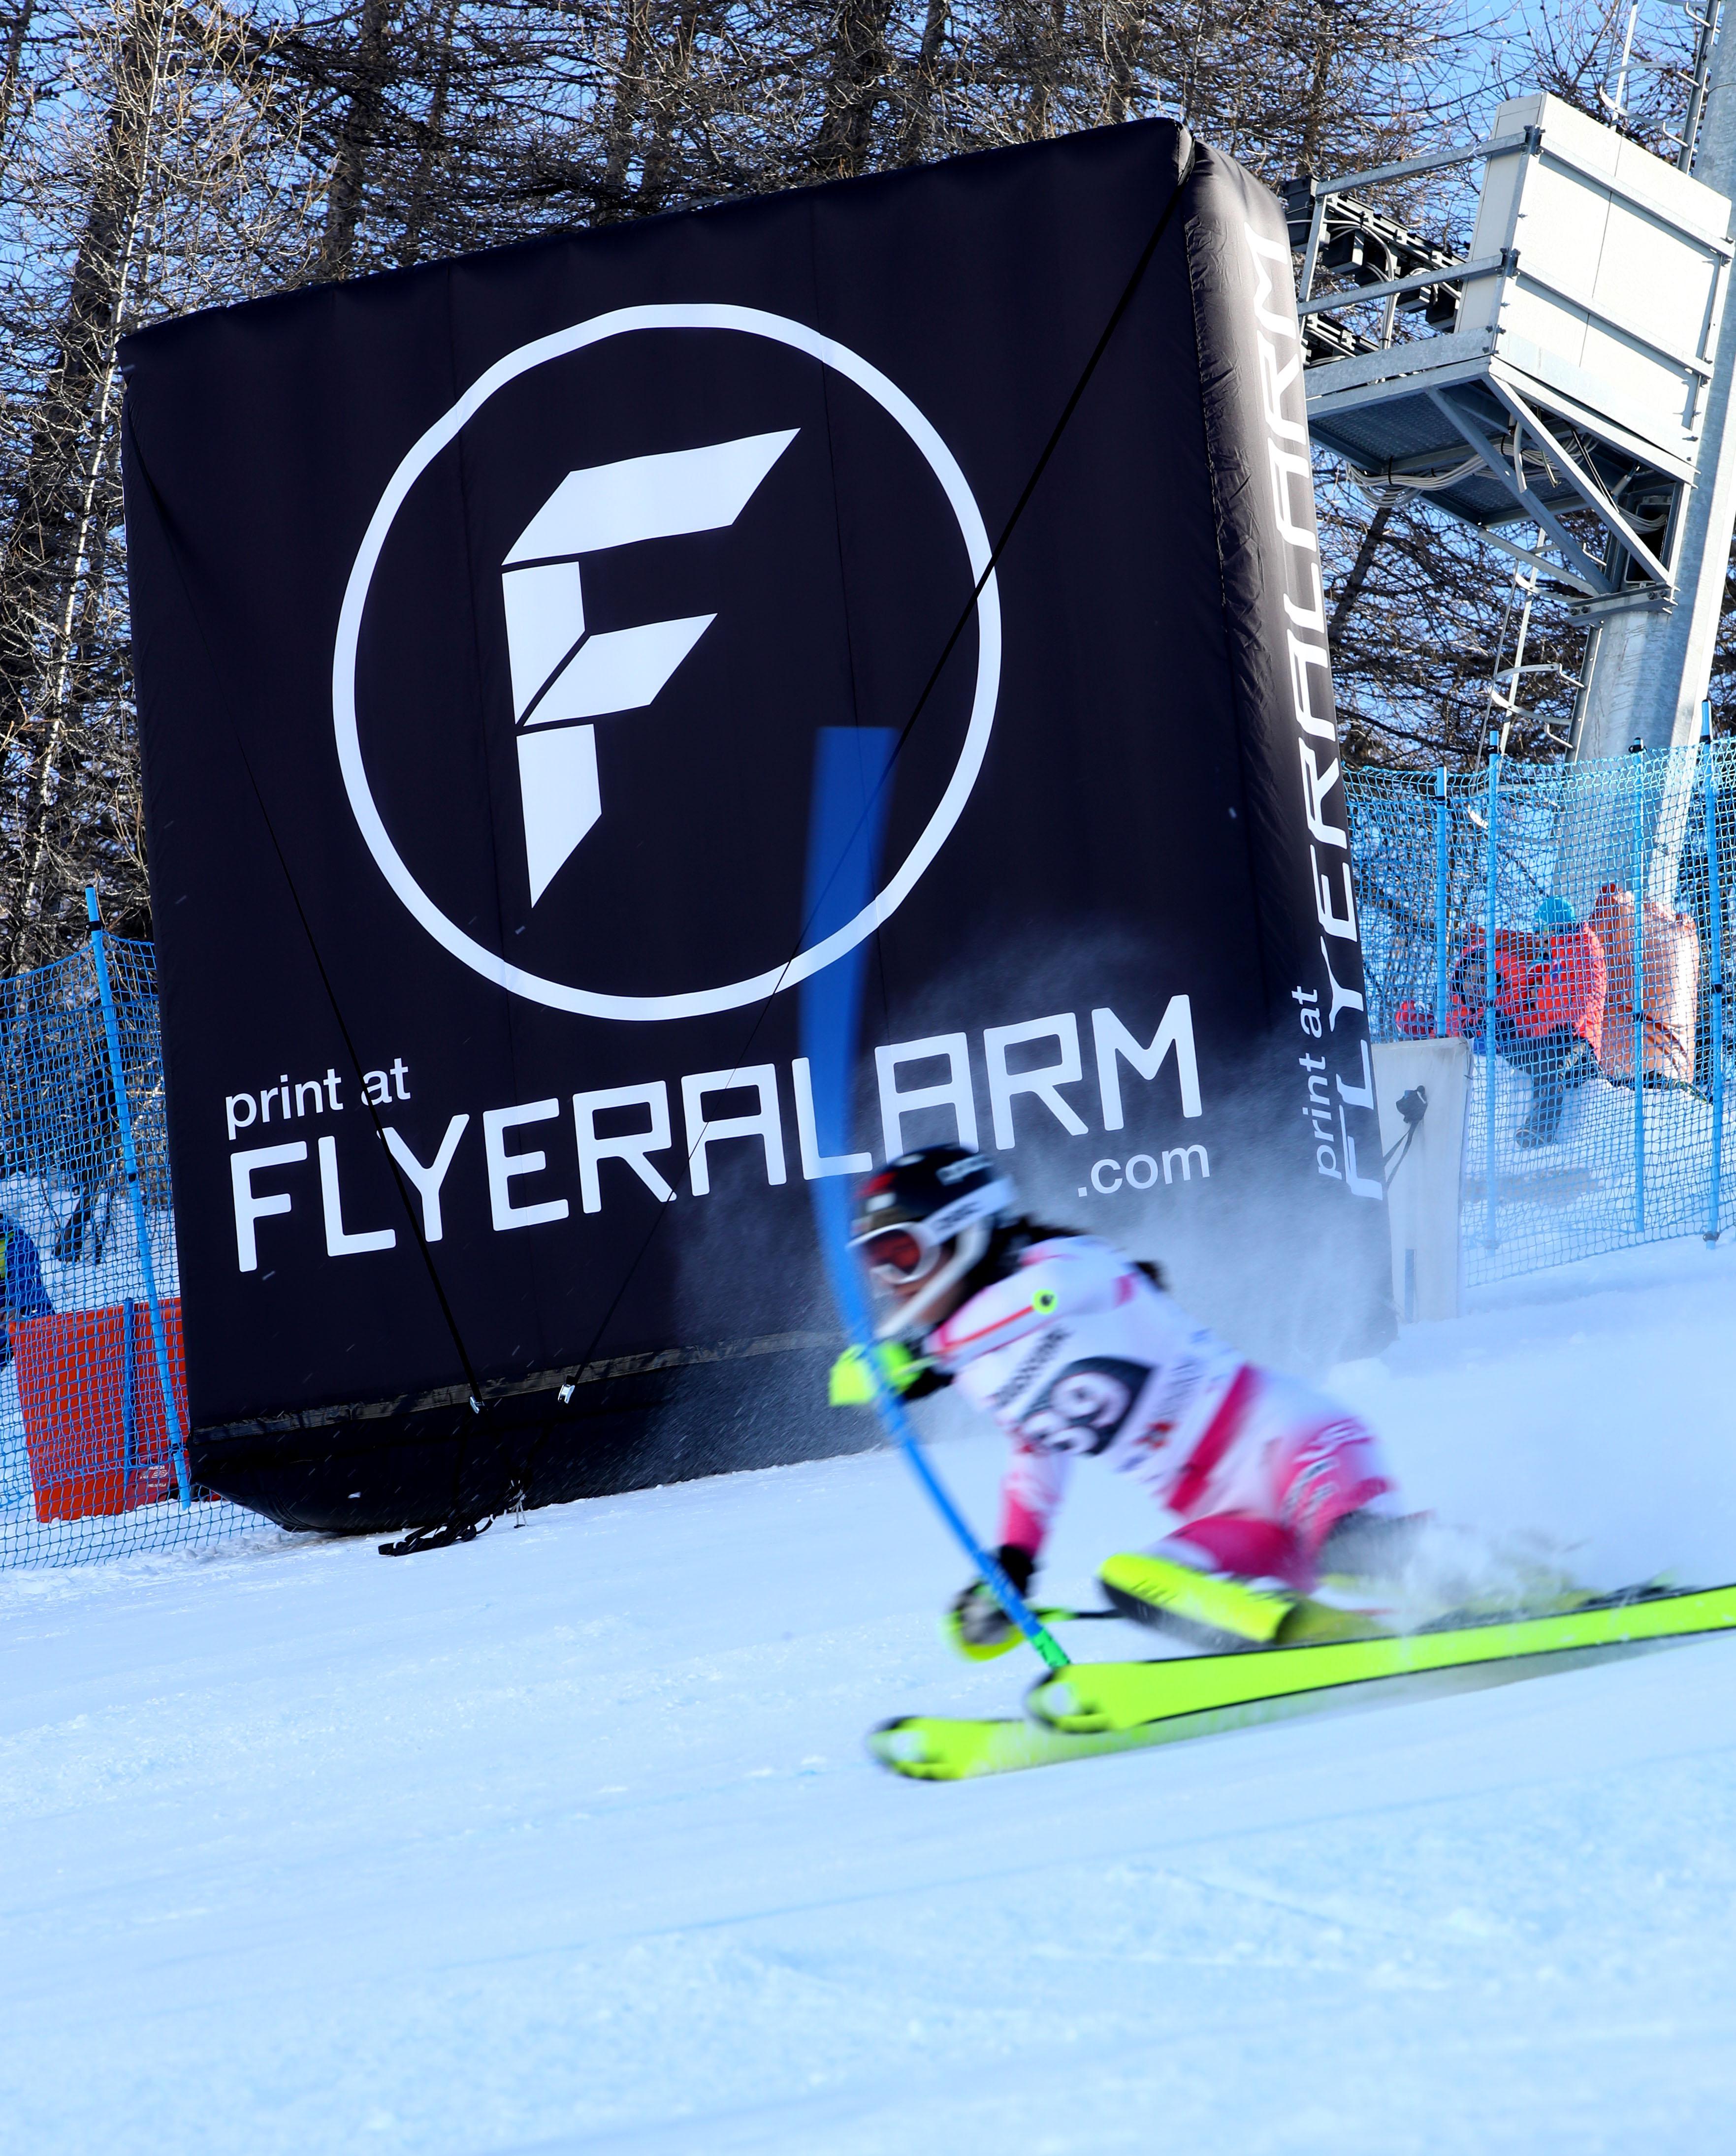 FLYERALARM Sportsponsoring Ski World Cup